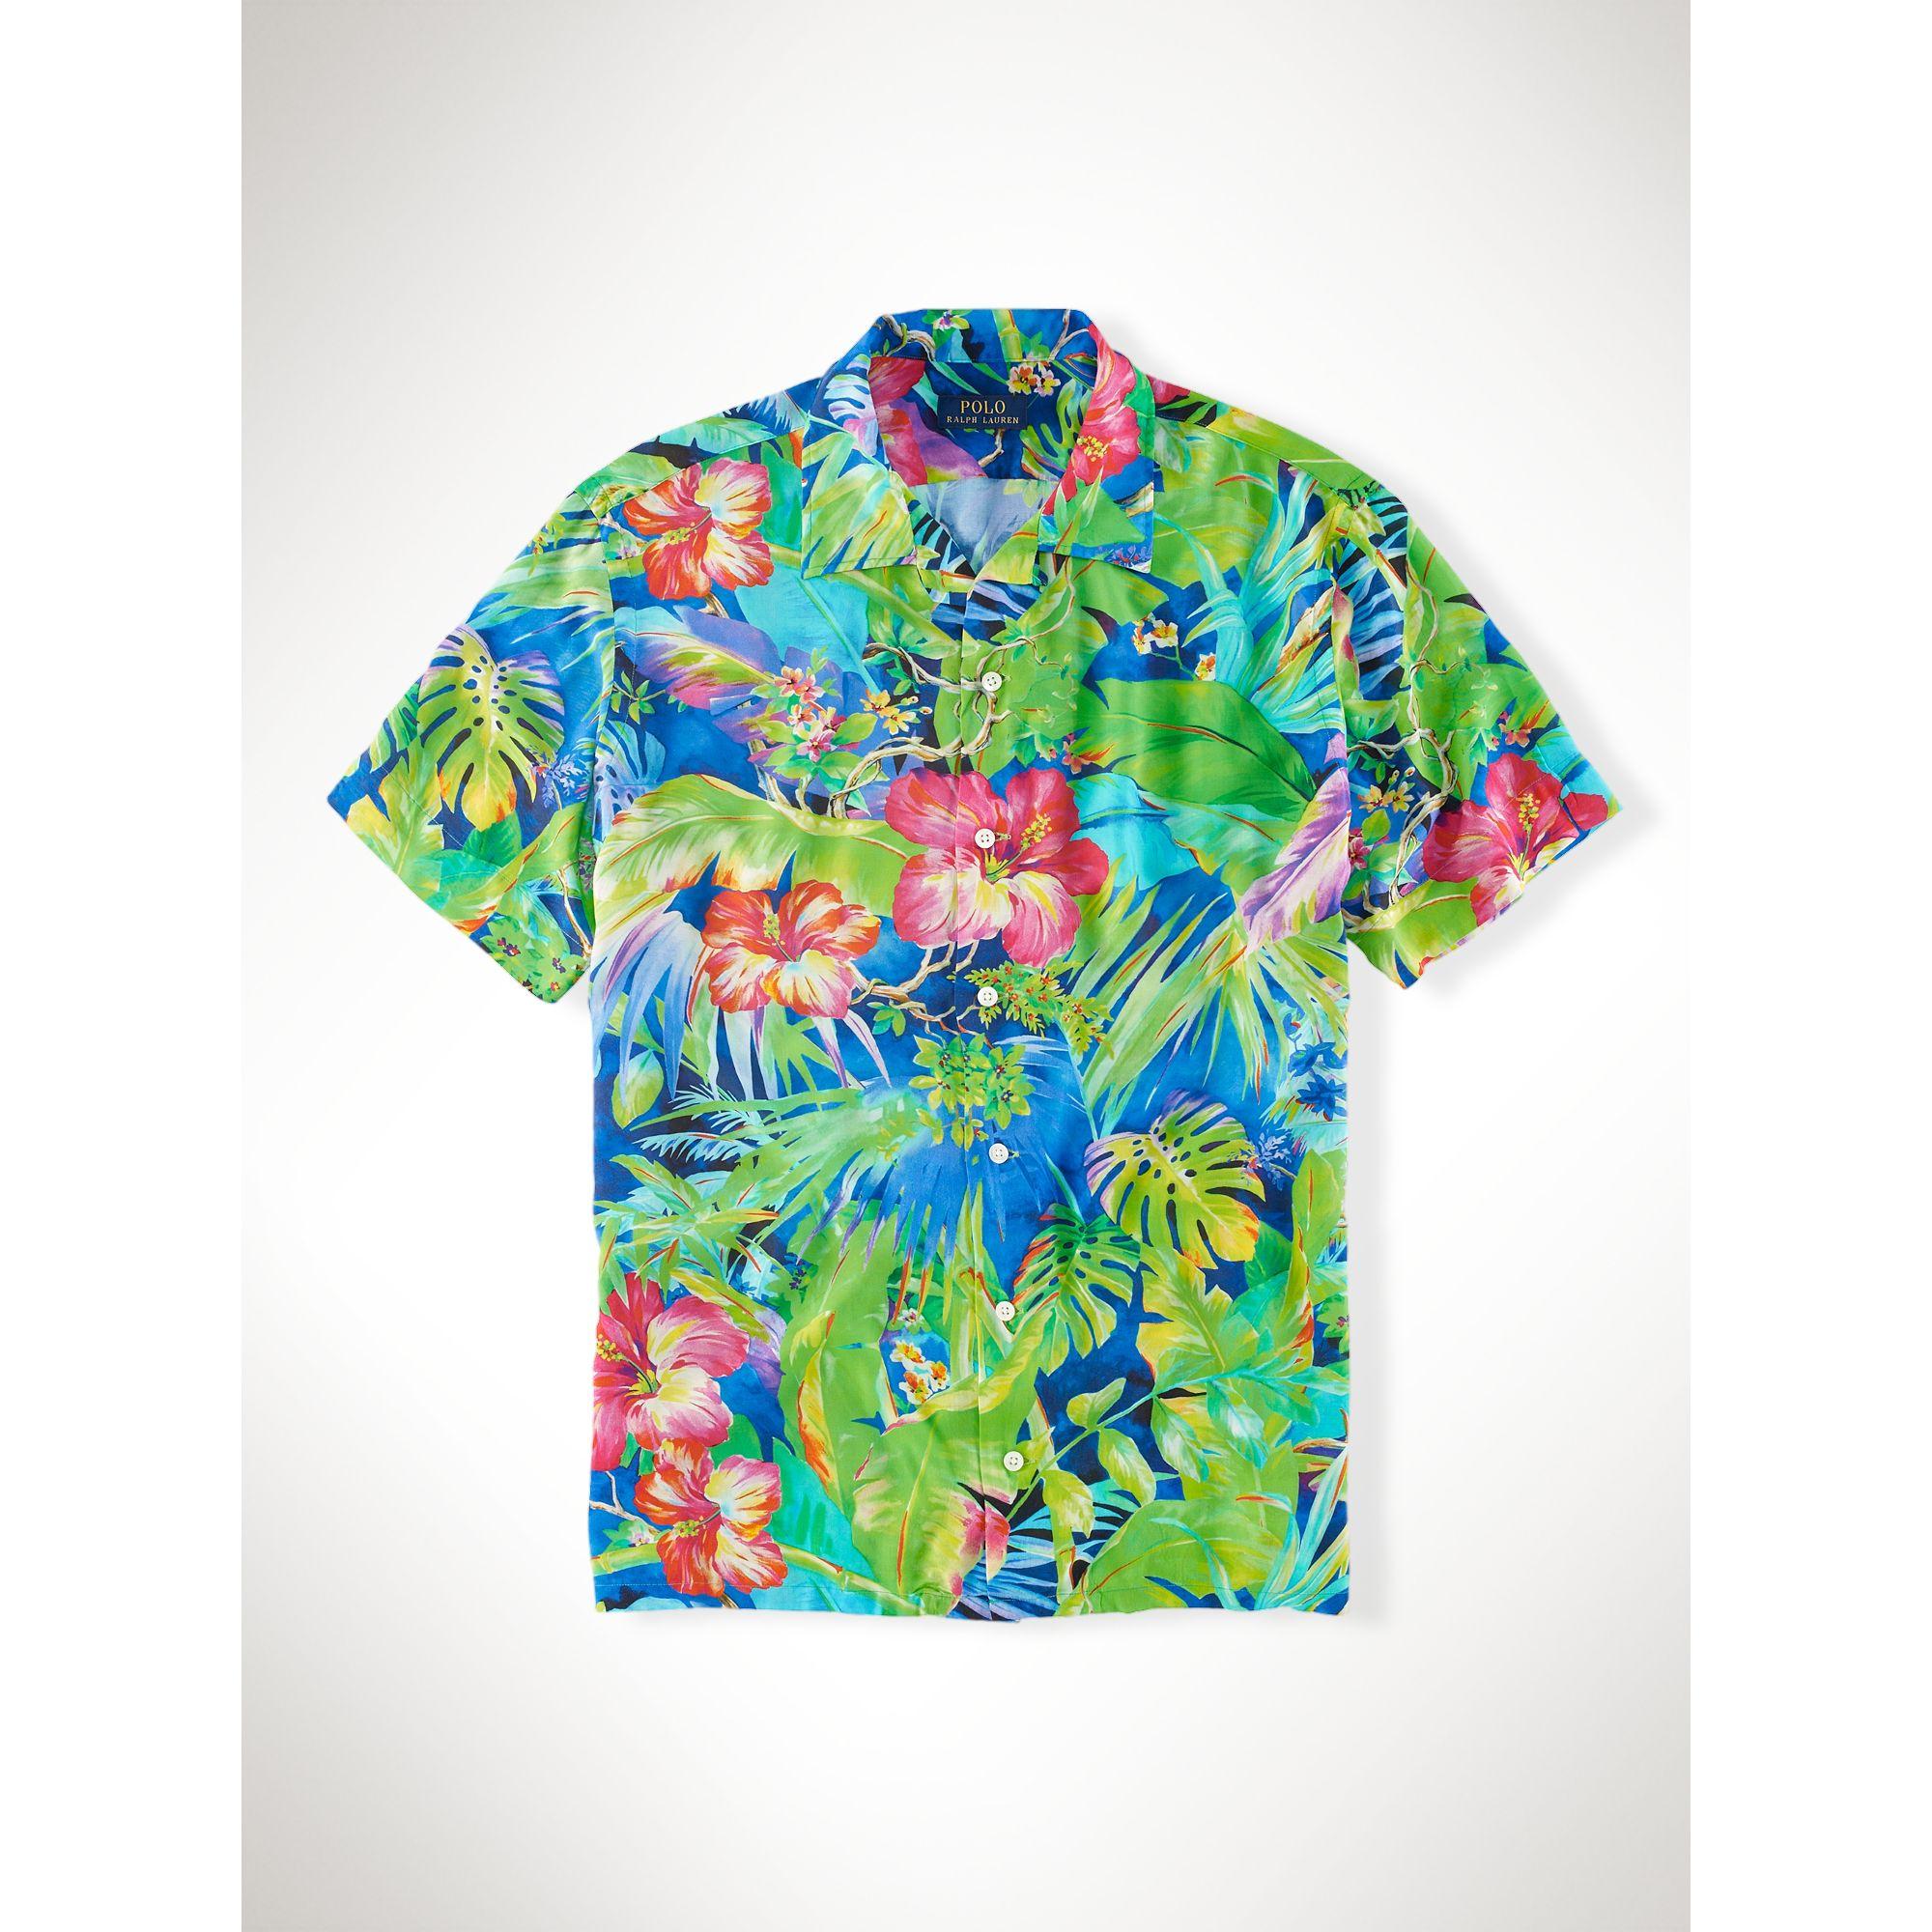 d159424848f83 Lyst - Polo Ralph Lauren Floral-Print Camp Shirt for Men